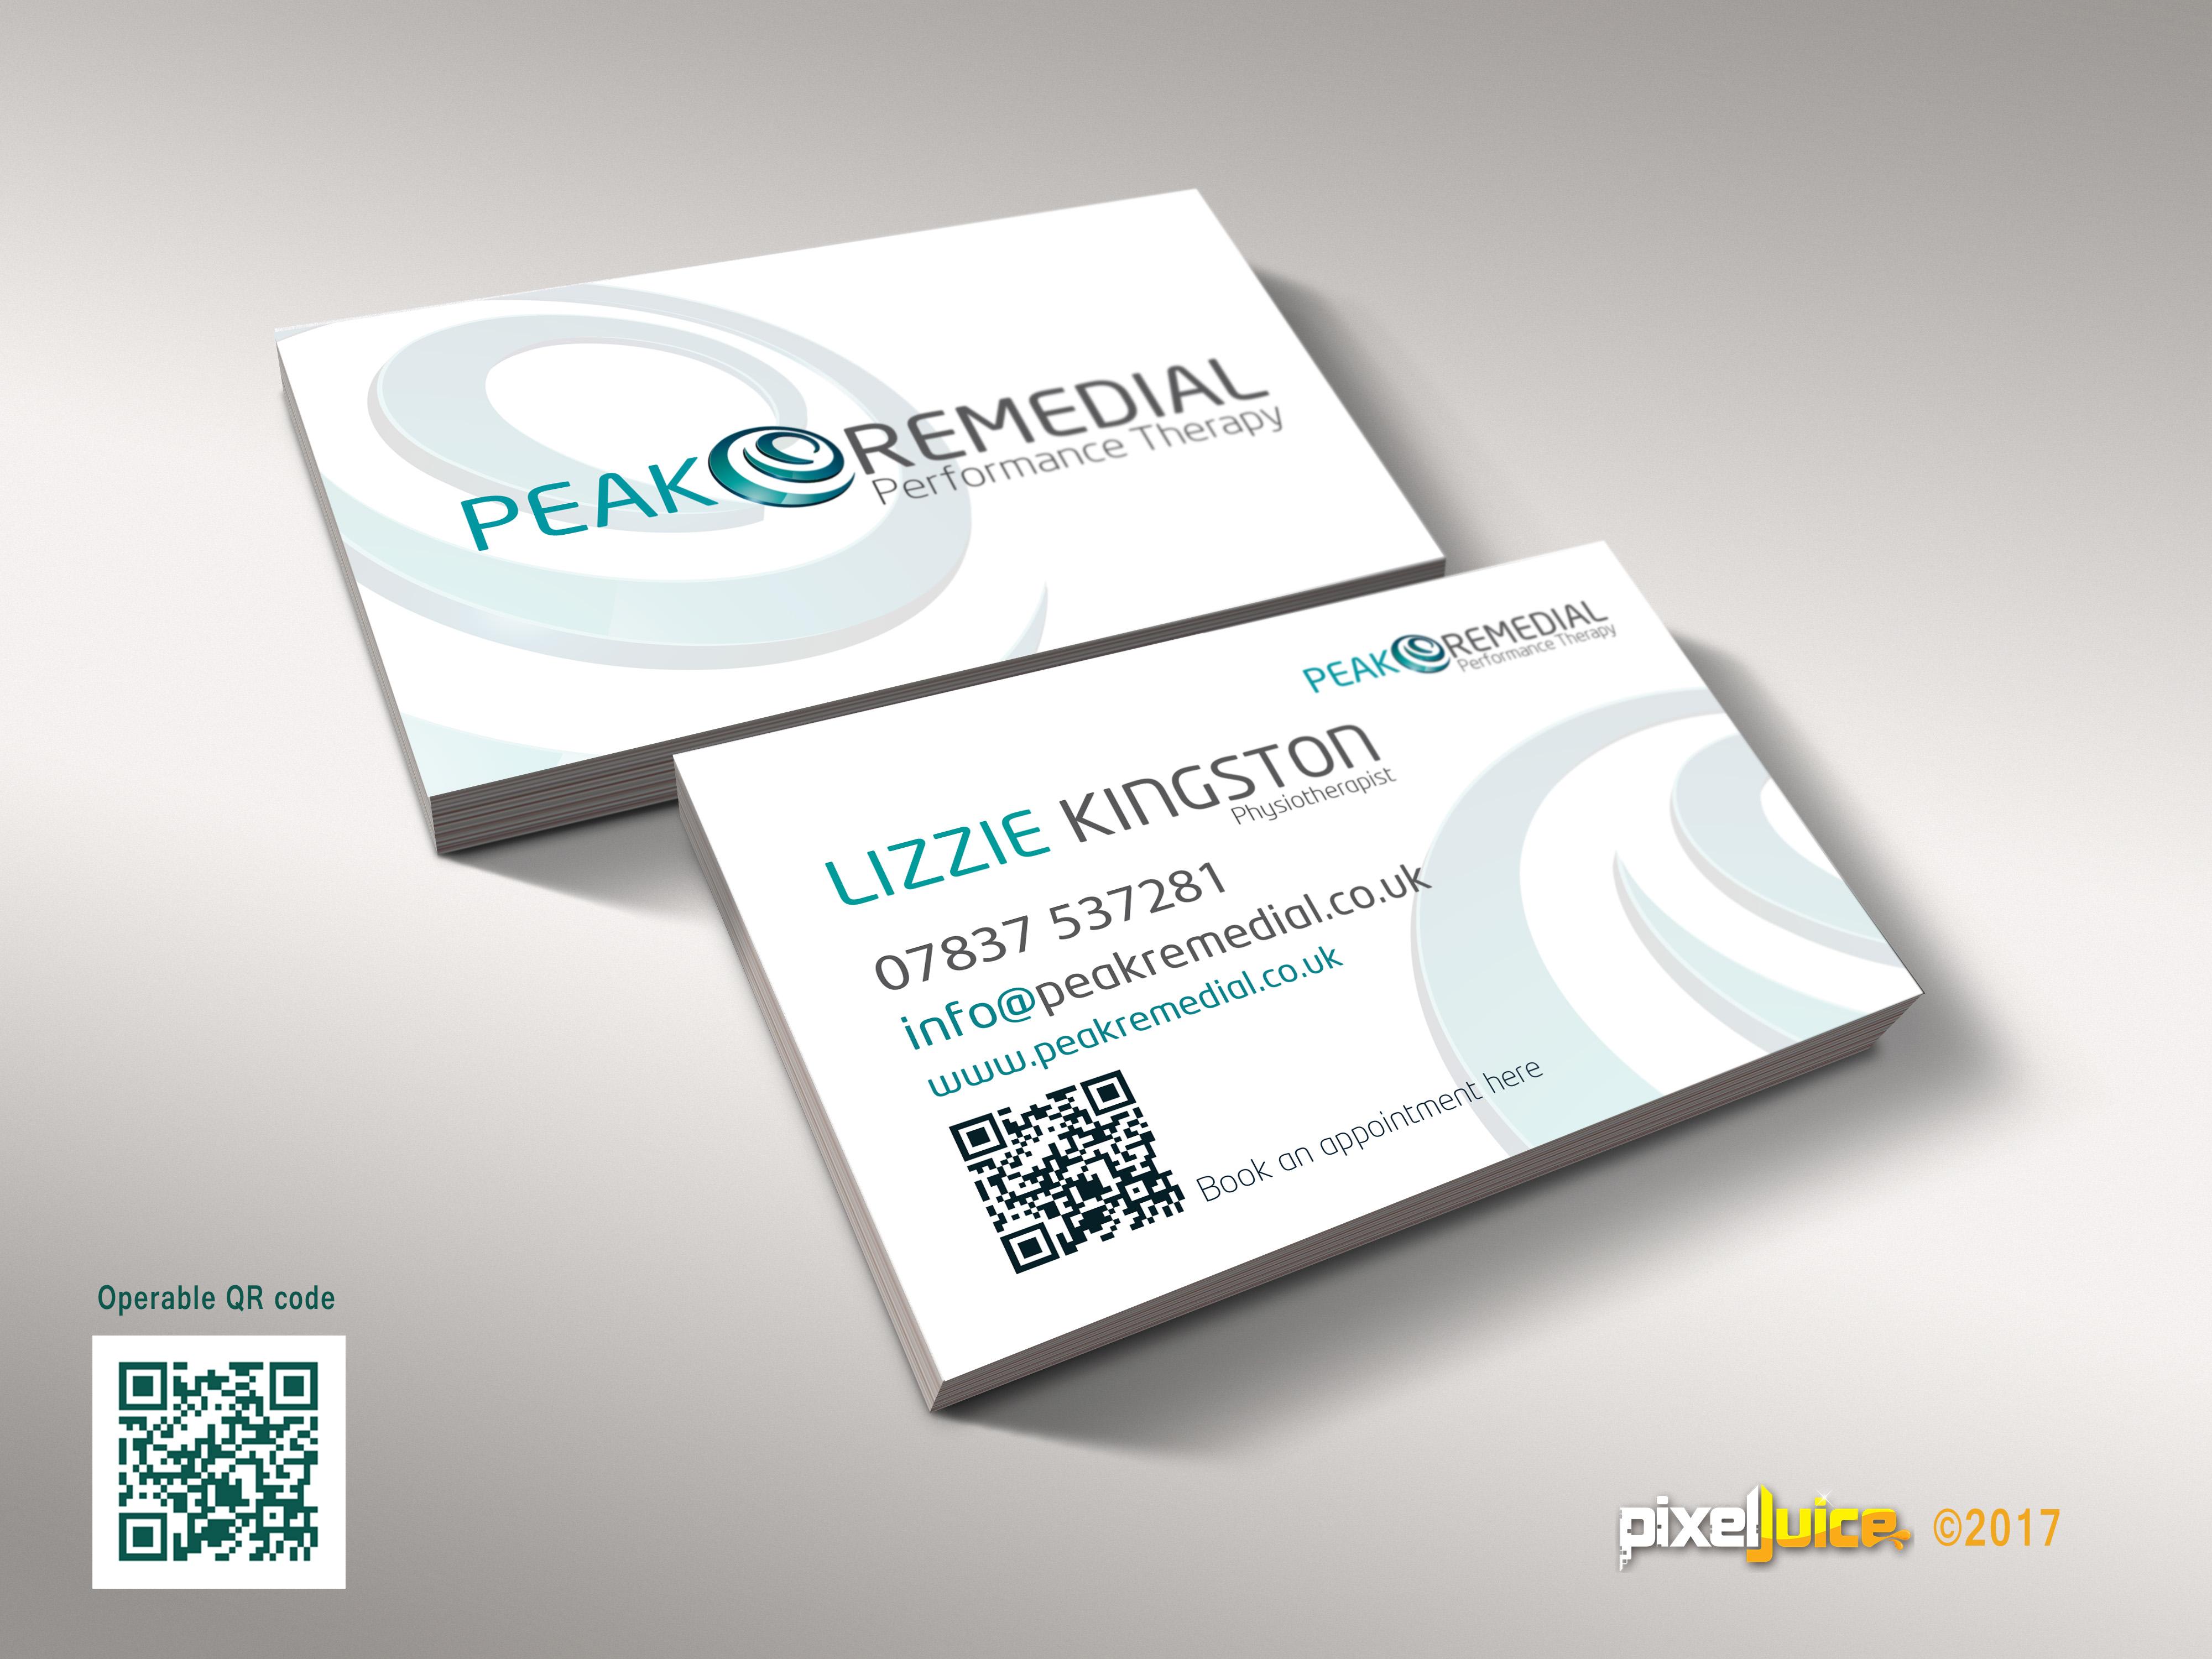 Peak Remedial – PixelJuice